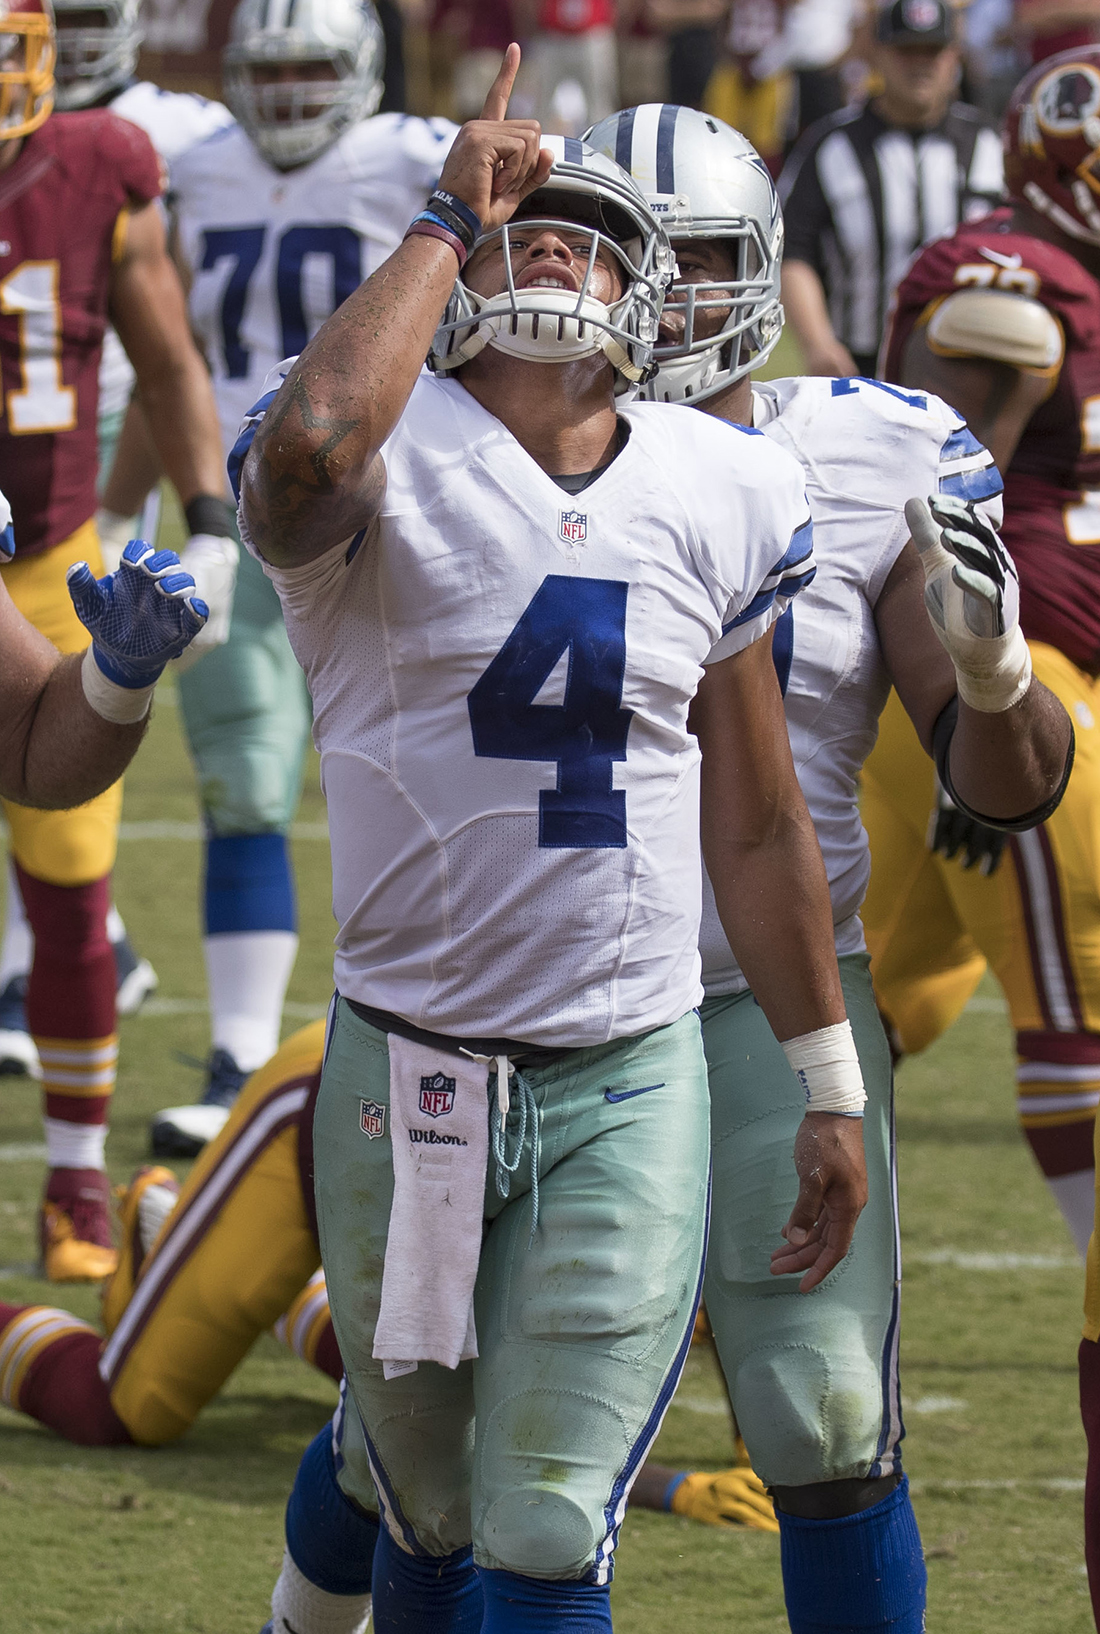 5def1fa56fb Dak Prescott, Cowboys at Redskins 9/18/16. Photo by Keith Allison,  Wikipedia.